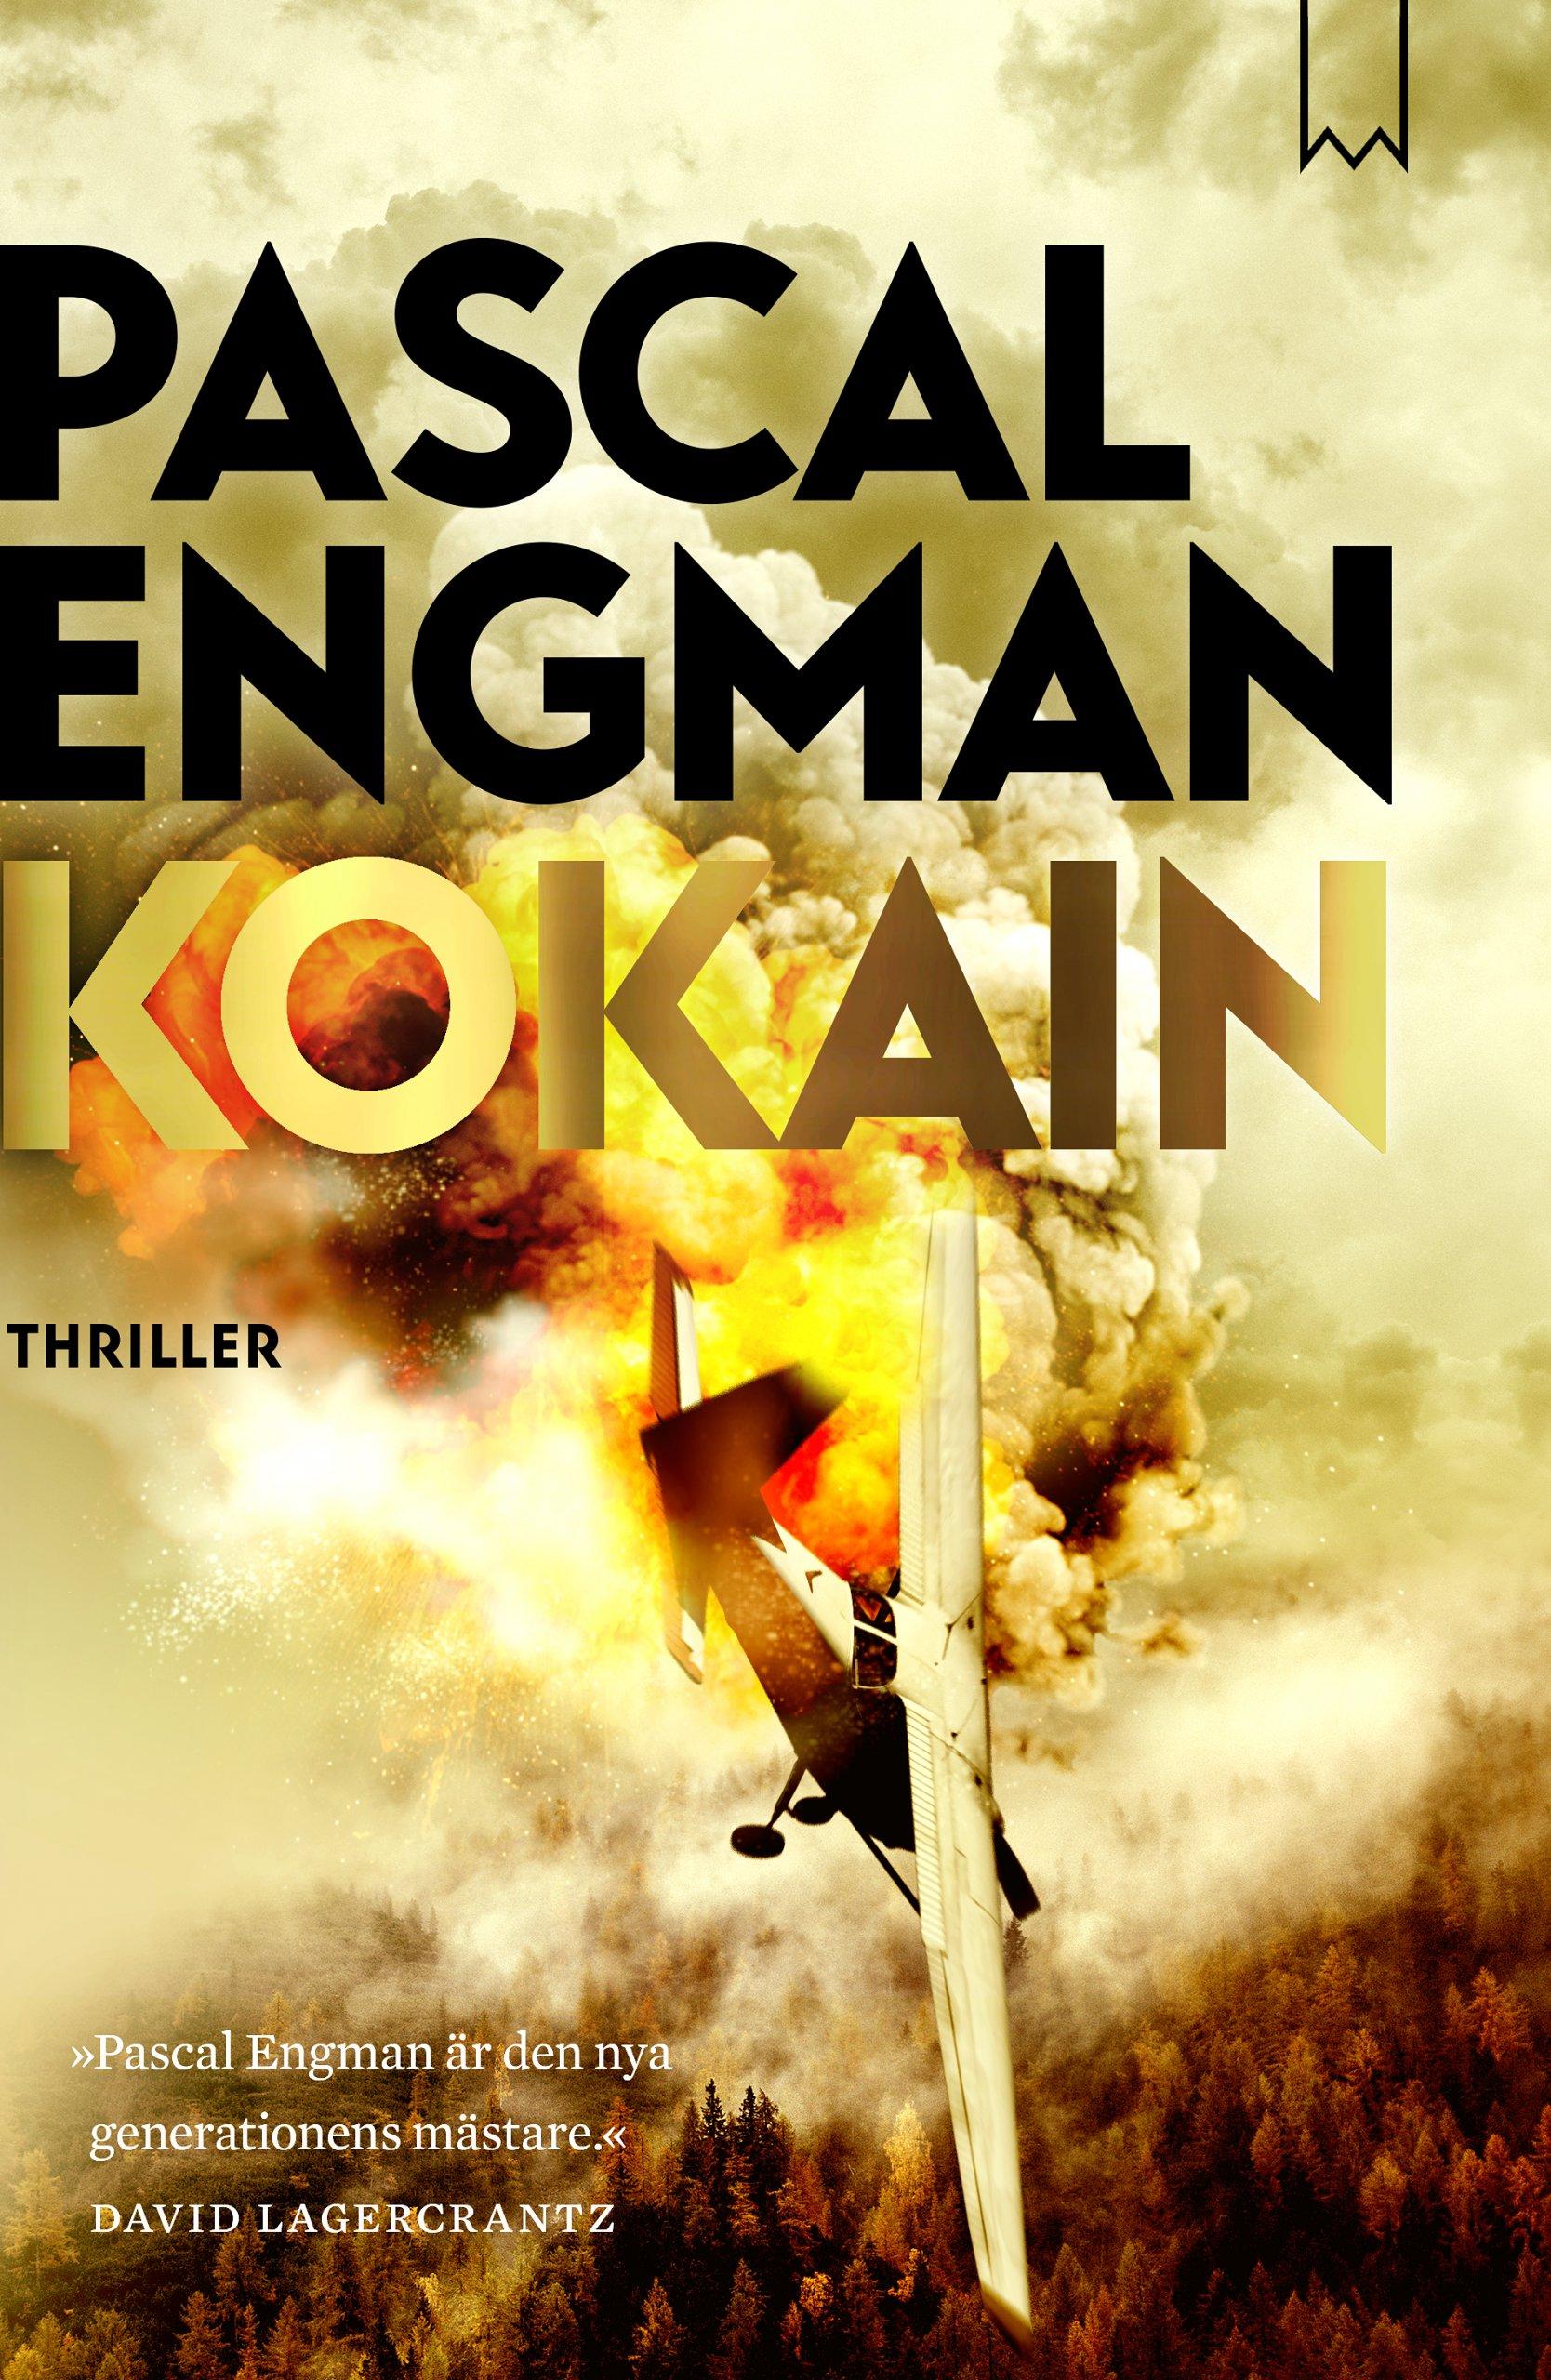 kokain_pascal_engman